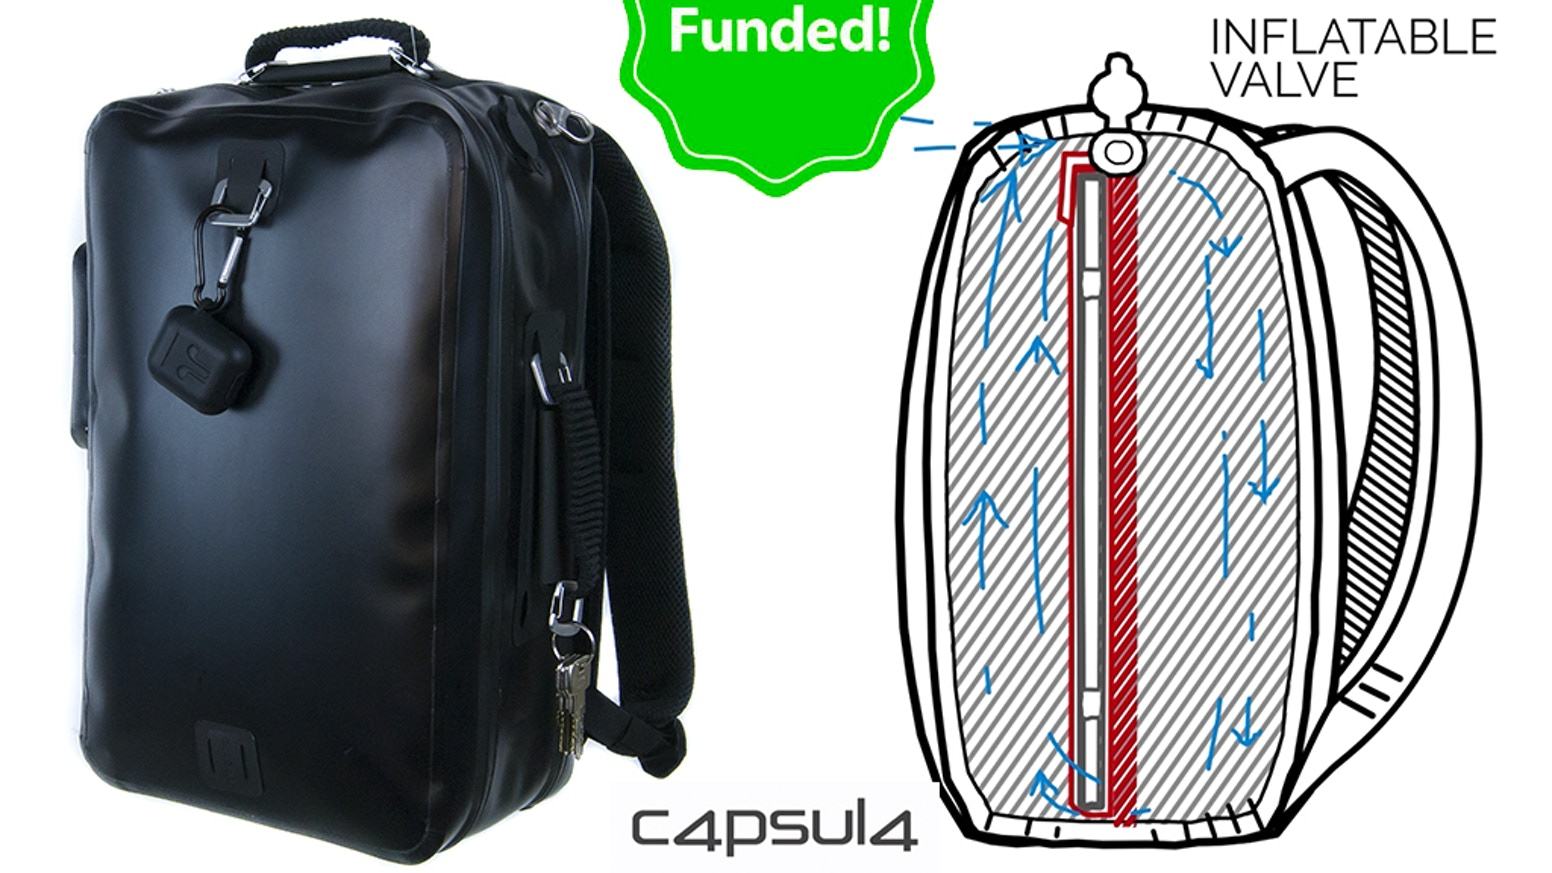 ee08927d42 CAPSULA  the toughest bags ever! by IMAGINATION FARM USA LLC ...